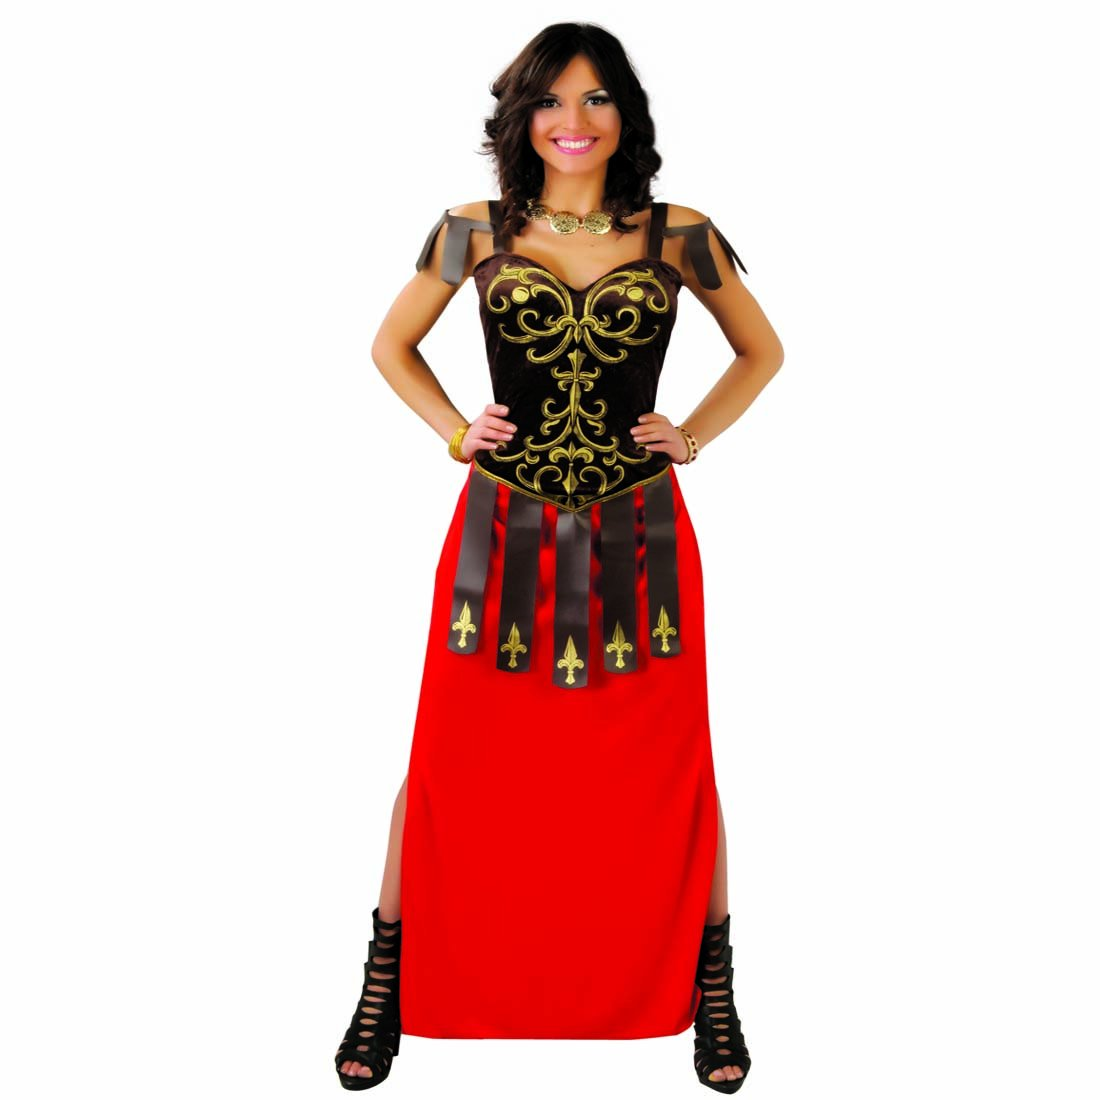 NET TOYS Disfraz de Romana Traje gladiadora L 42/44 Ropa ...